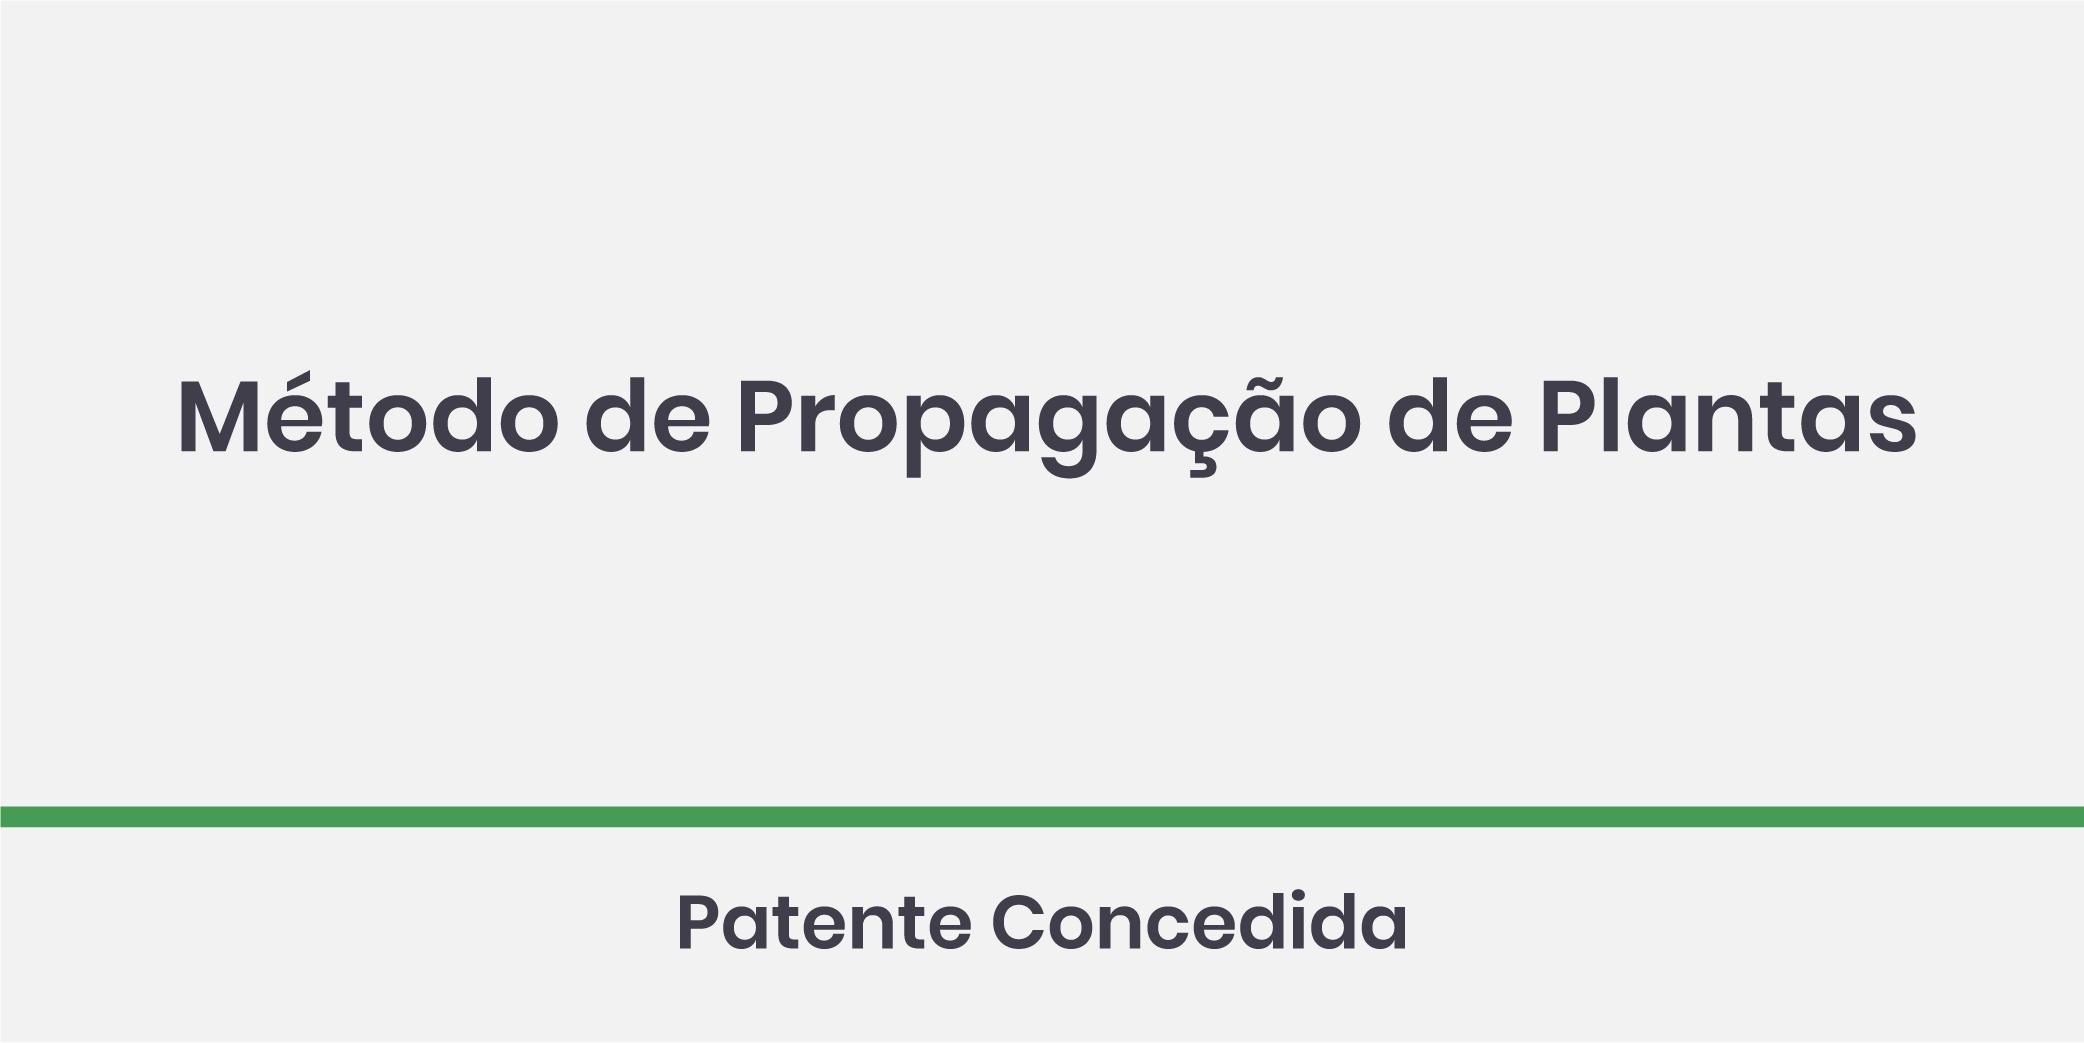 Método de propagação de plantas; Patente Concedida